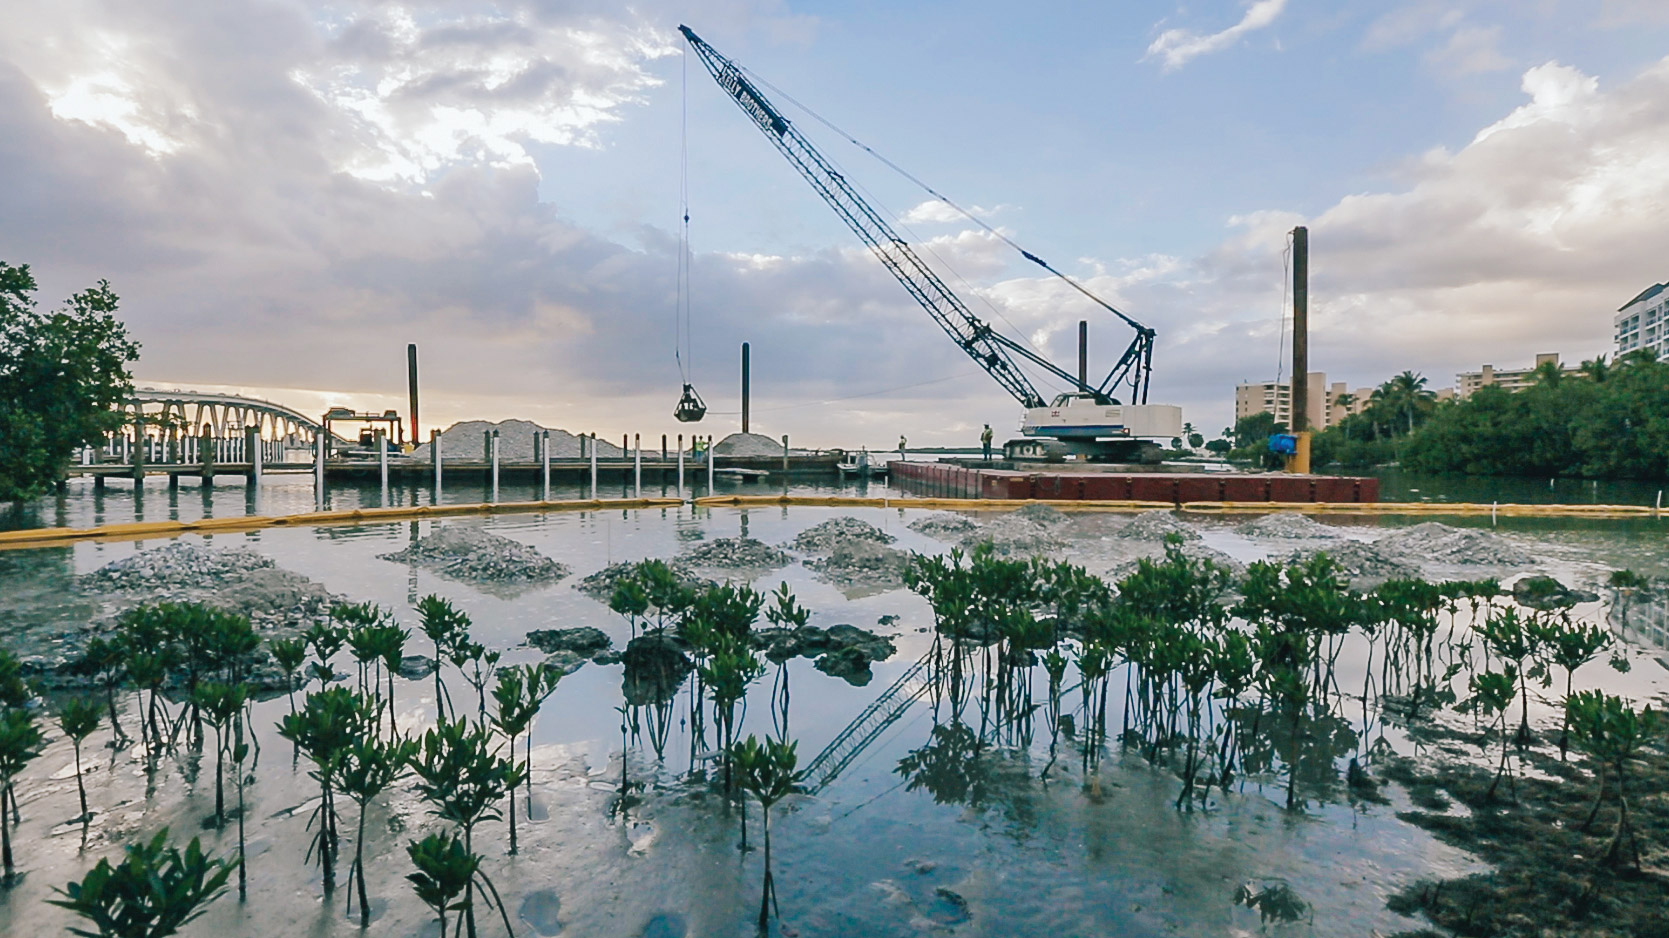 Punta Rassa Crane Apron Barges